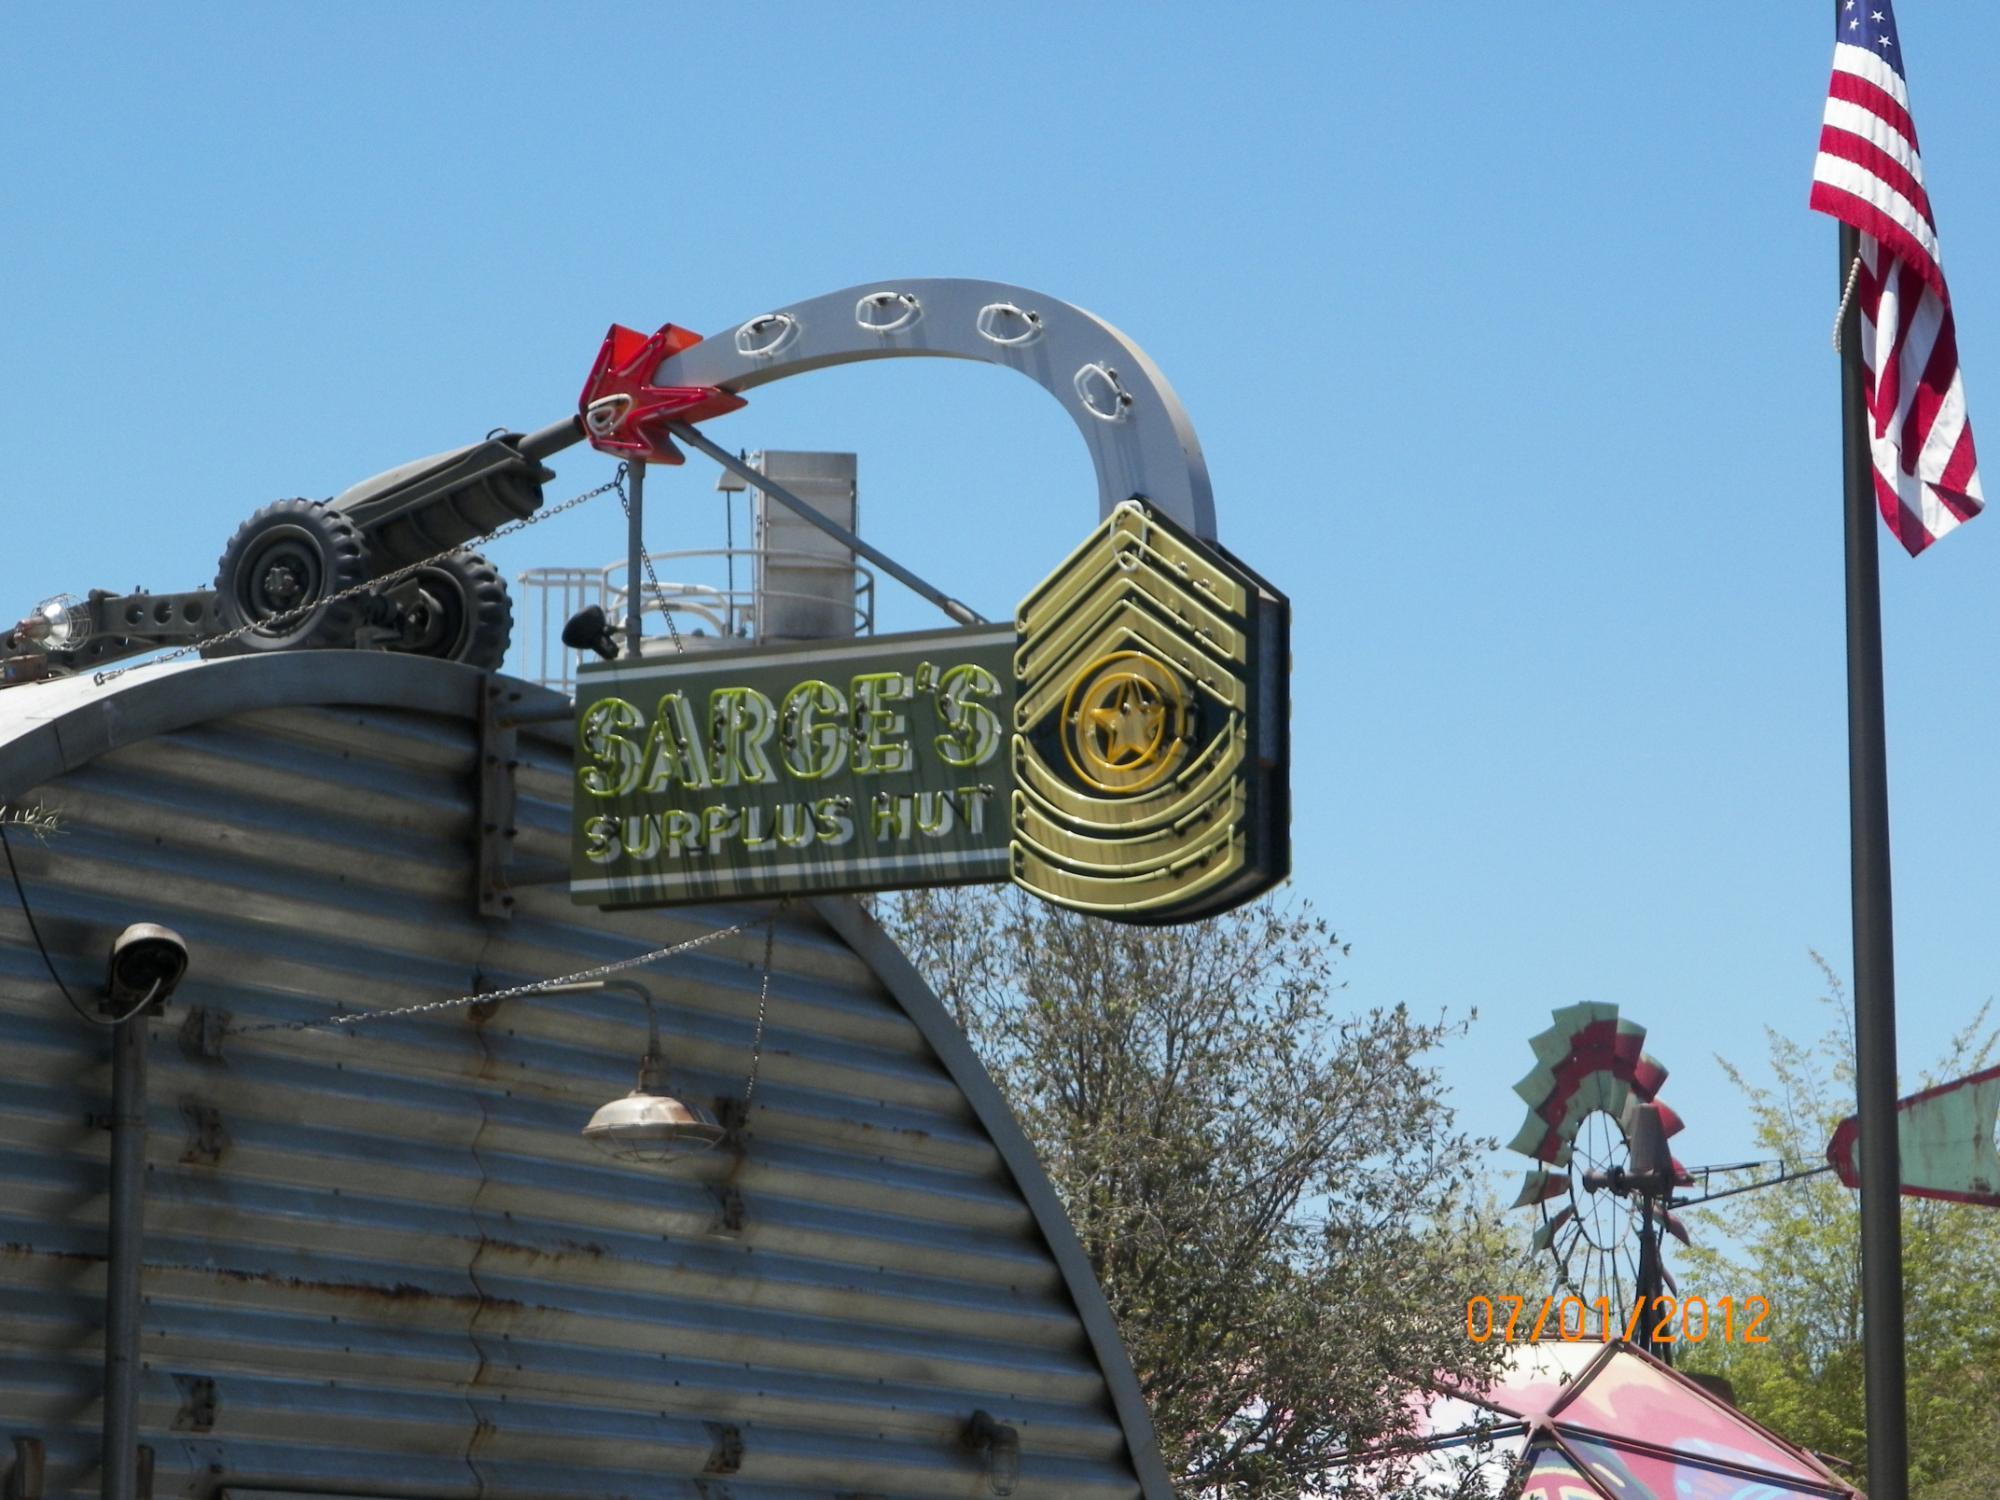 @ Disneyland